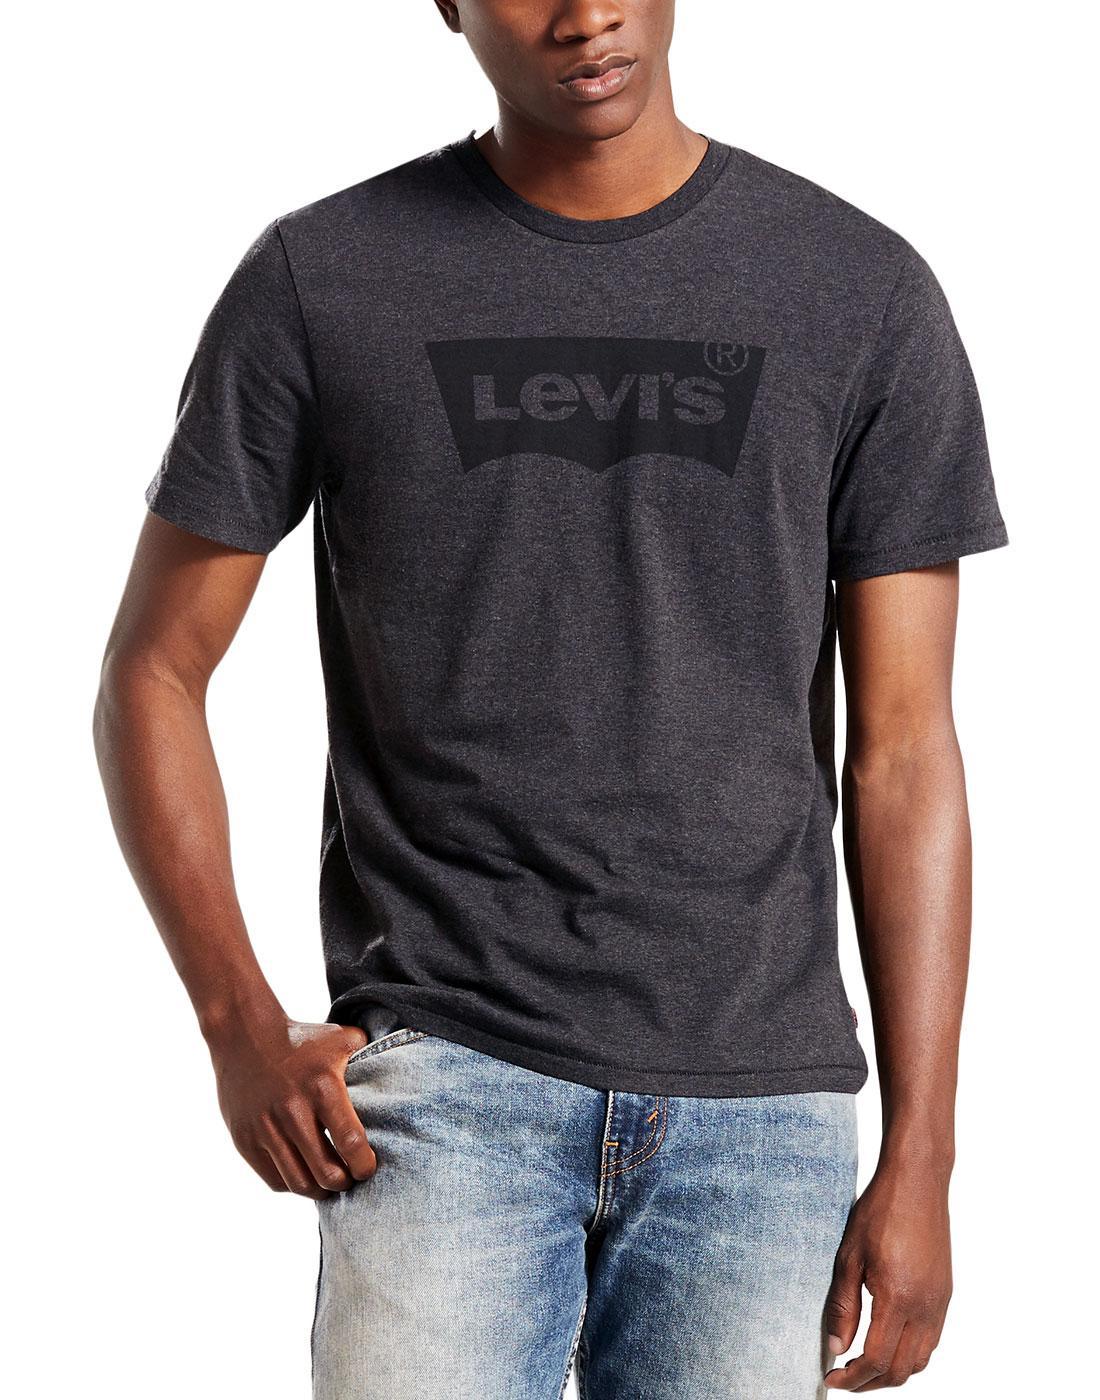 LEVI'S Mens Retro Housemark Batwing Logo Tee (BH)